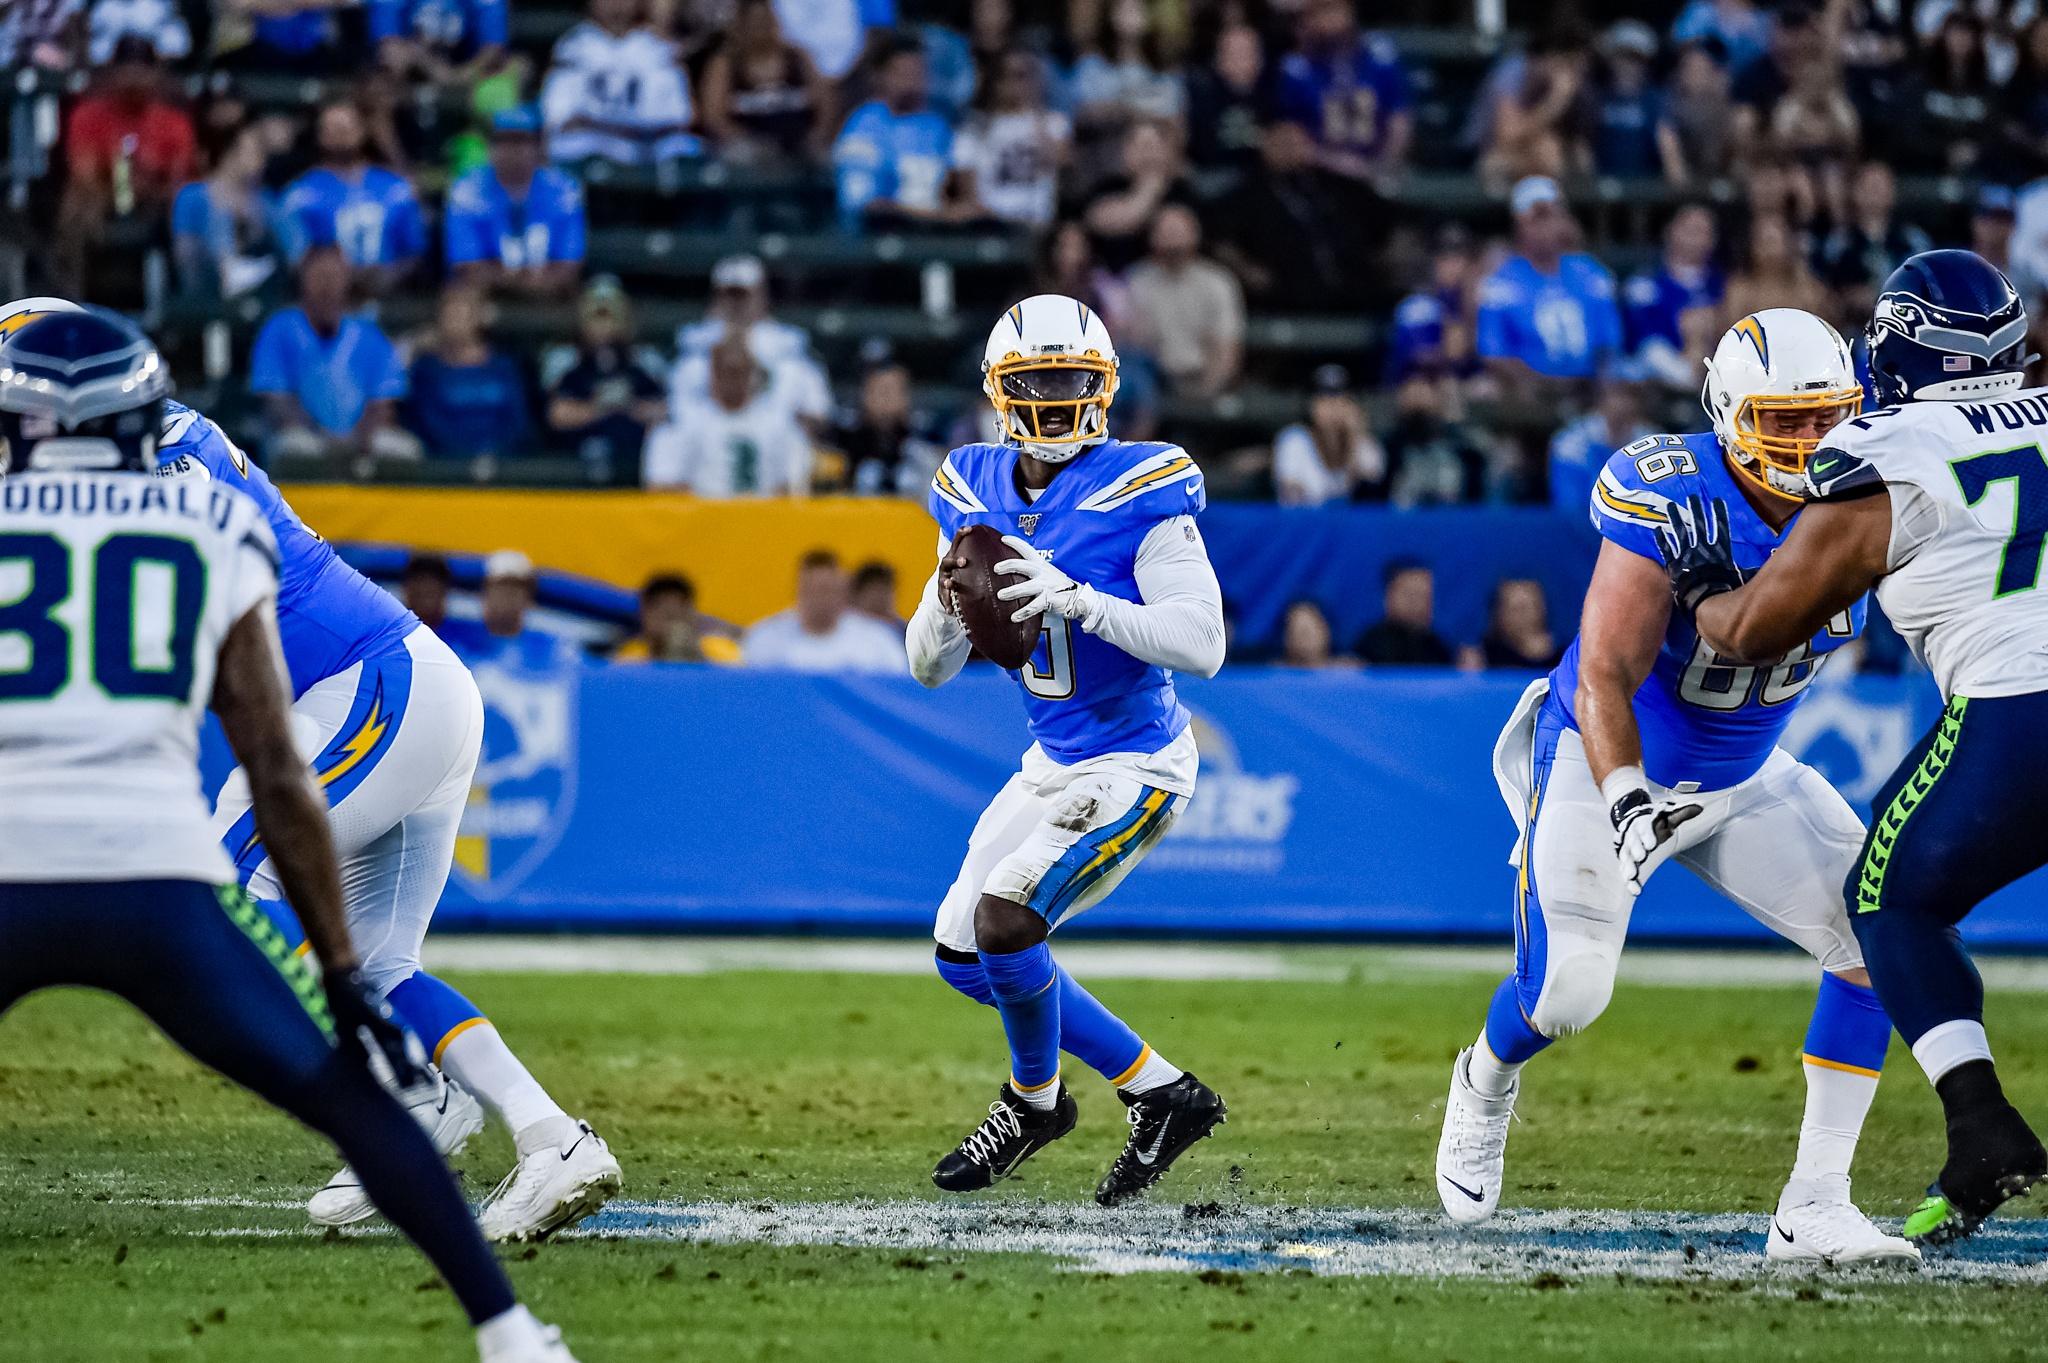 © Mark Hammond/News4usonline - Aug. 24, 2019 - Seahawks vs. Chargers - Quarterback Tyrod Taylor (5) looks to throw the ball downfield.